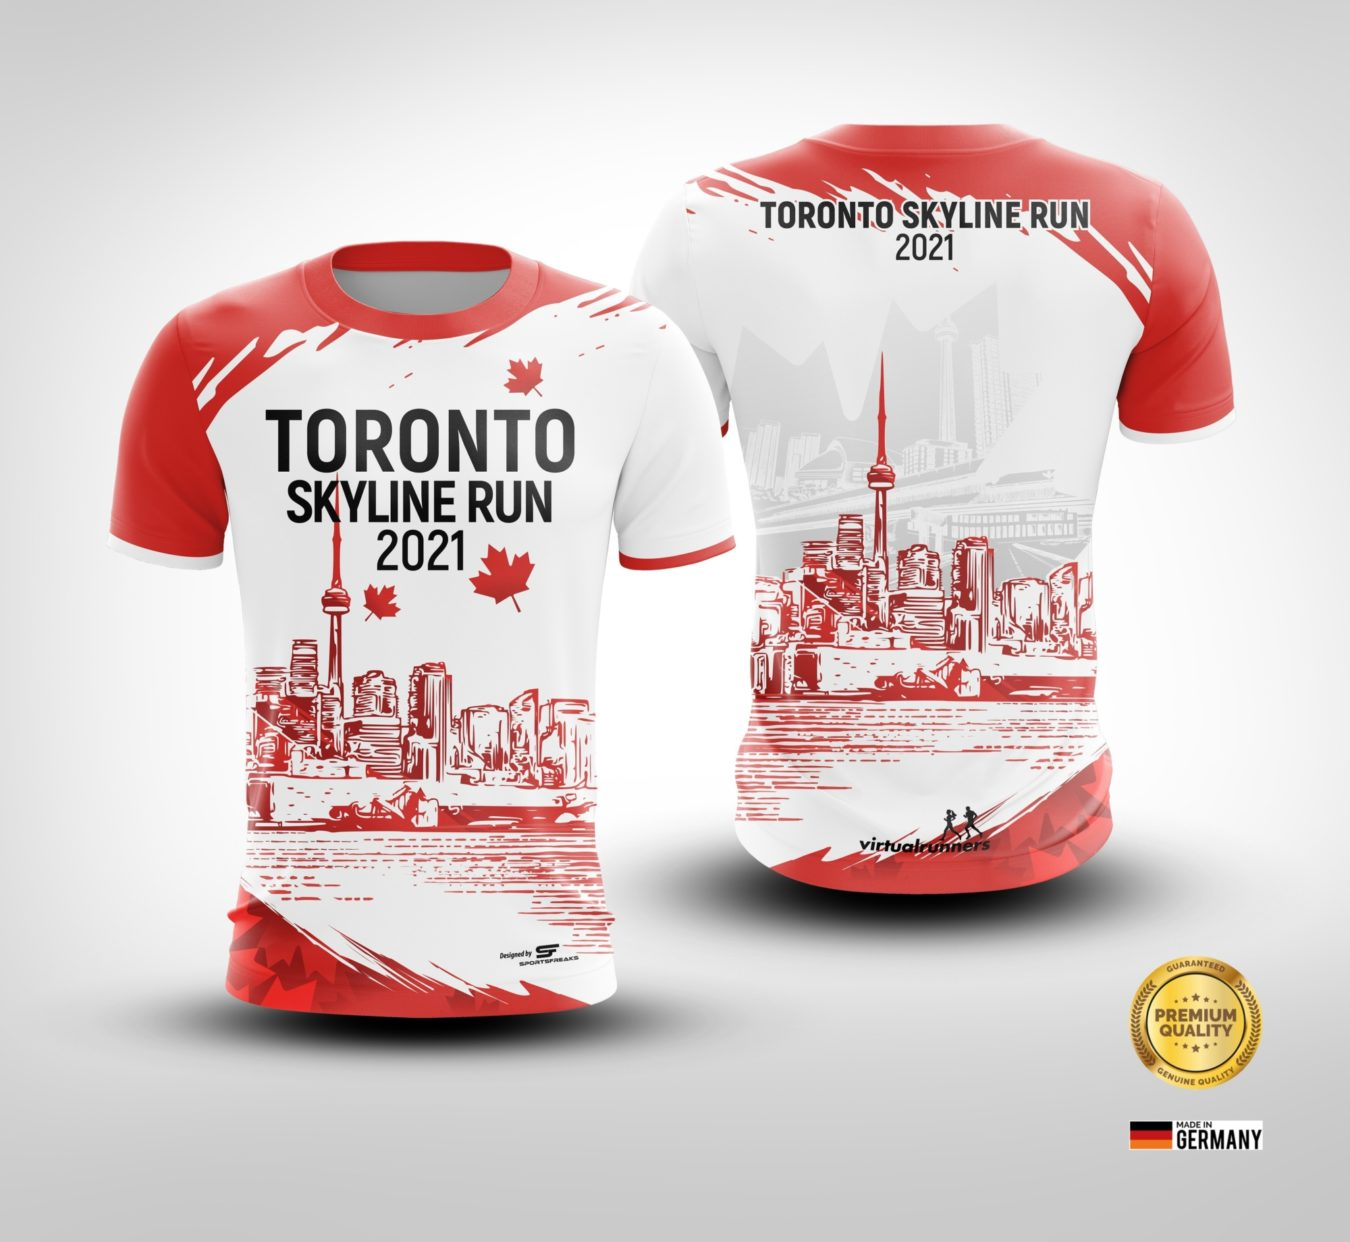 Jersey Poster Toronto Skyline Run2021 2 01